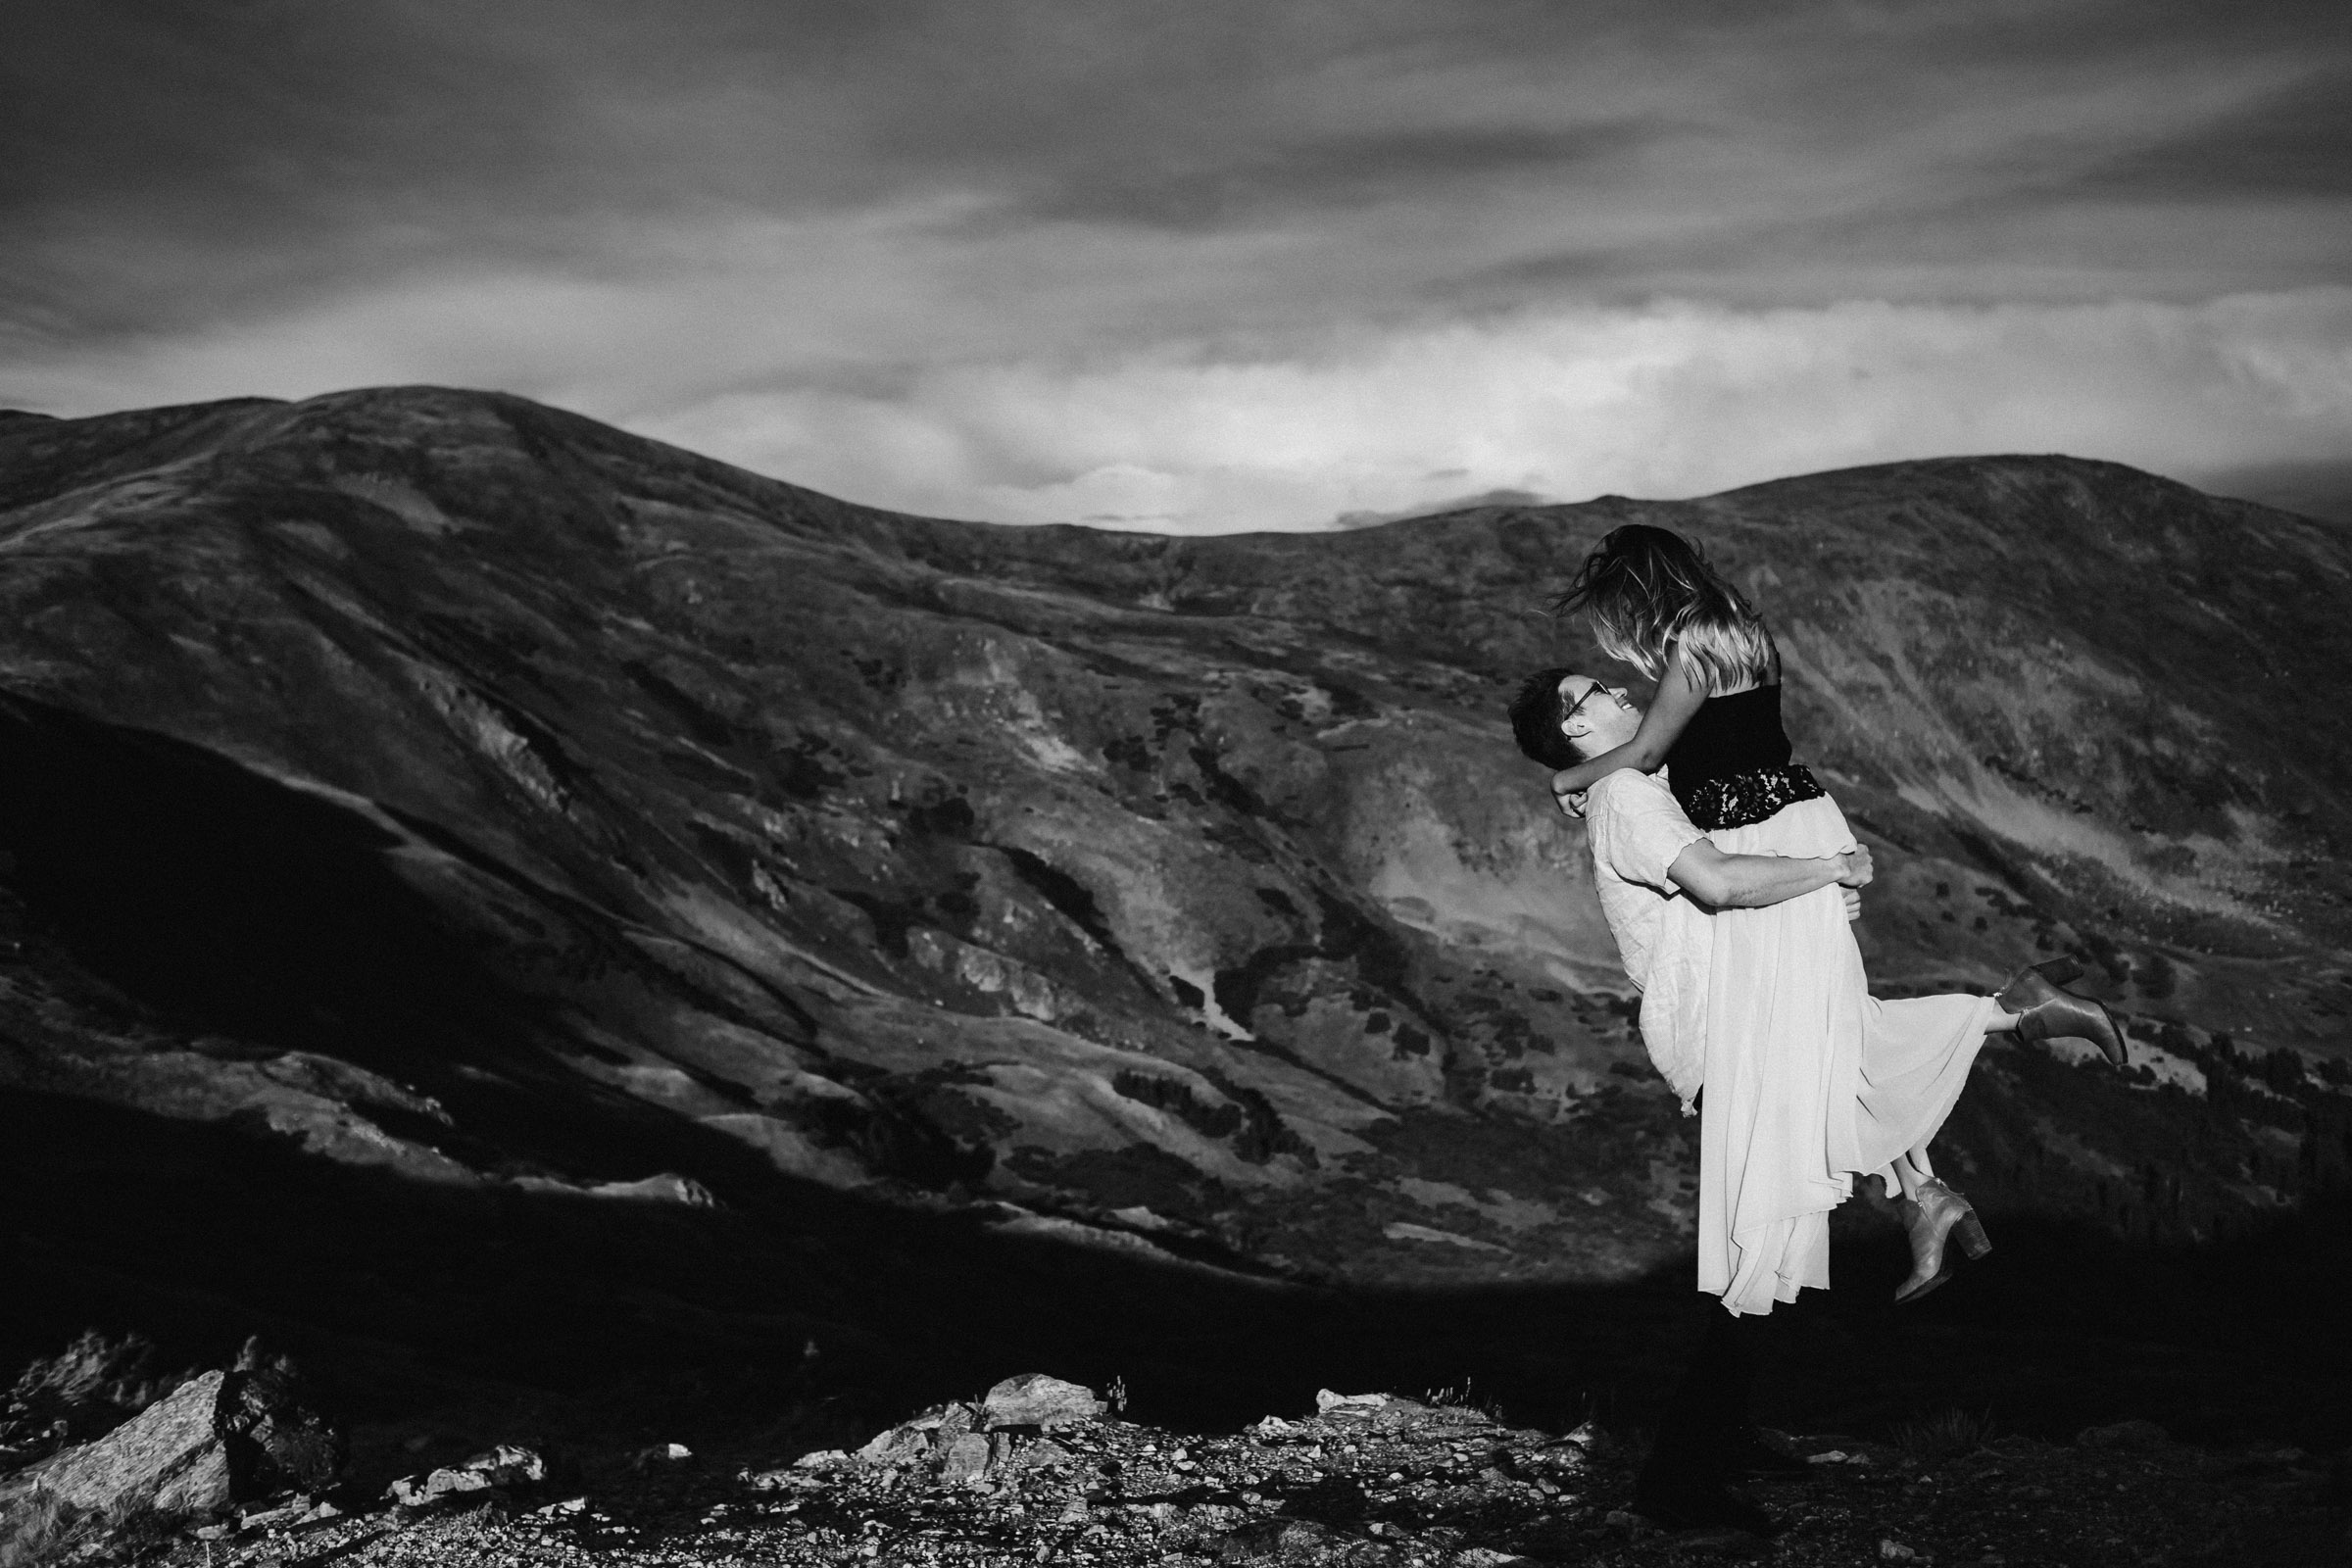 couplesadventurephotographer 10